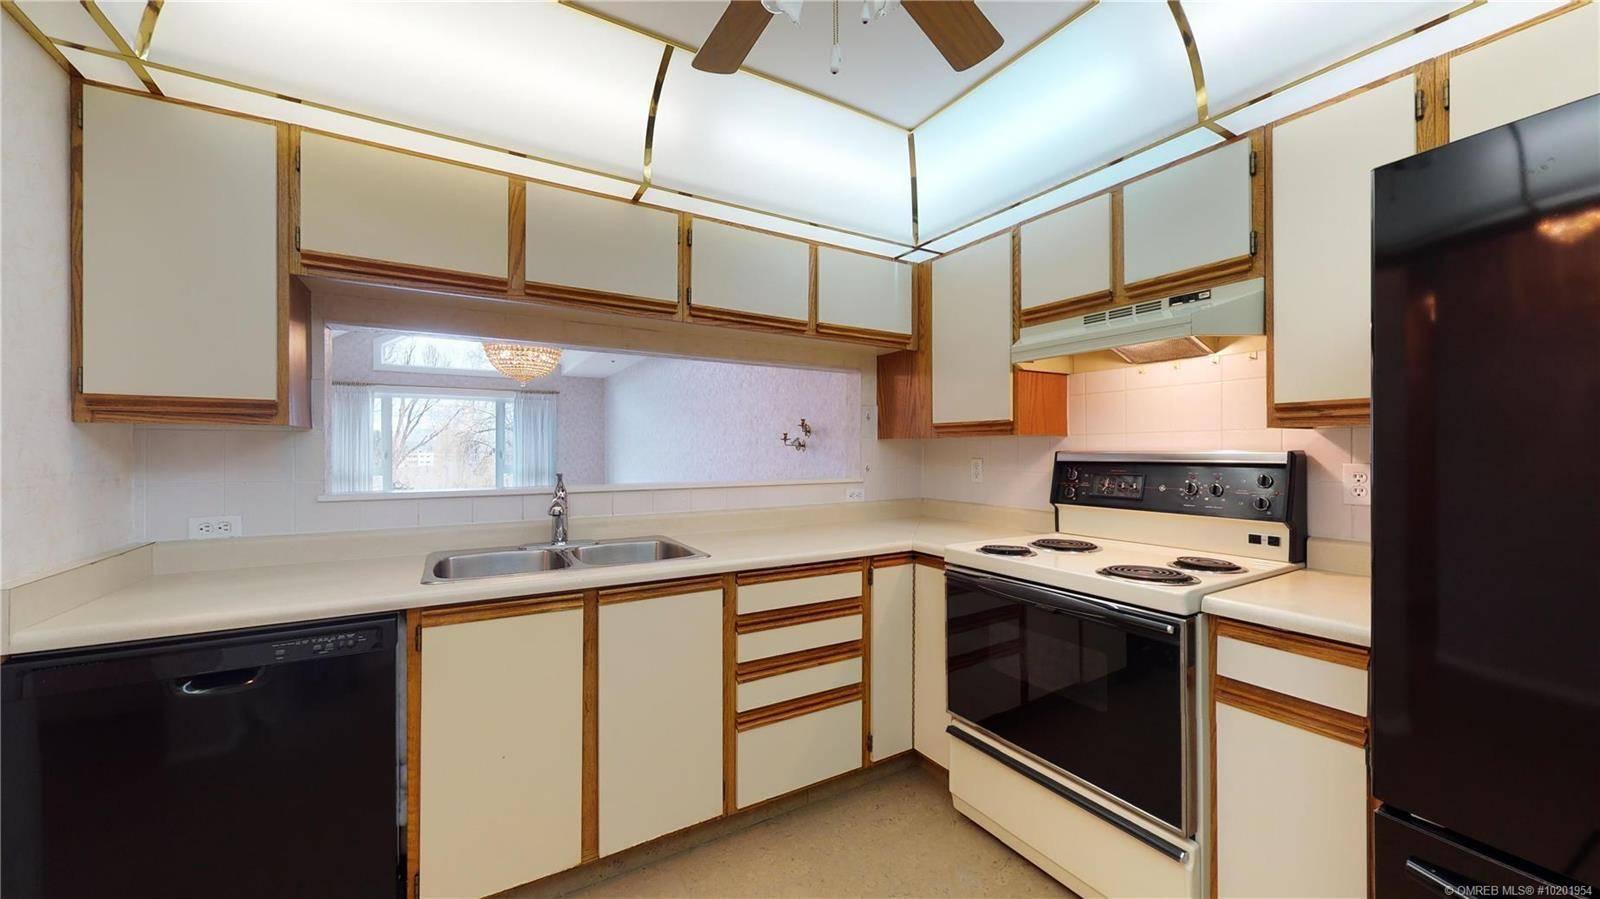 Condo for sale at 1045 Sutherland Ave Unit 334 Kelowna British Columbia - MLS: 10201954